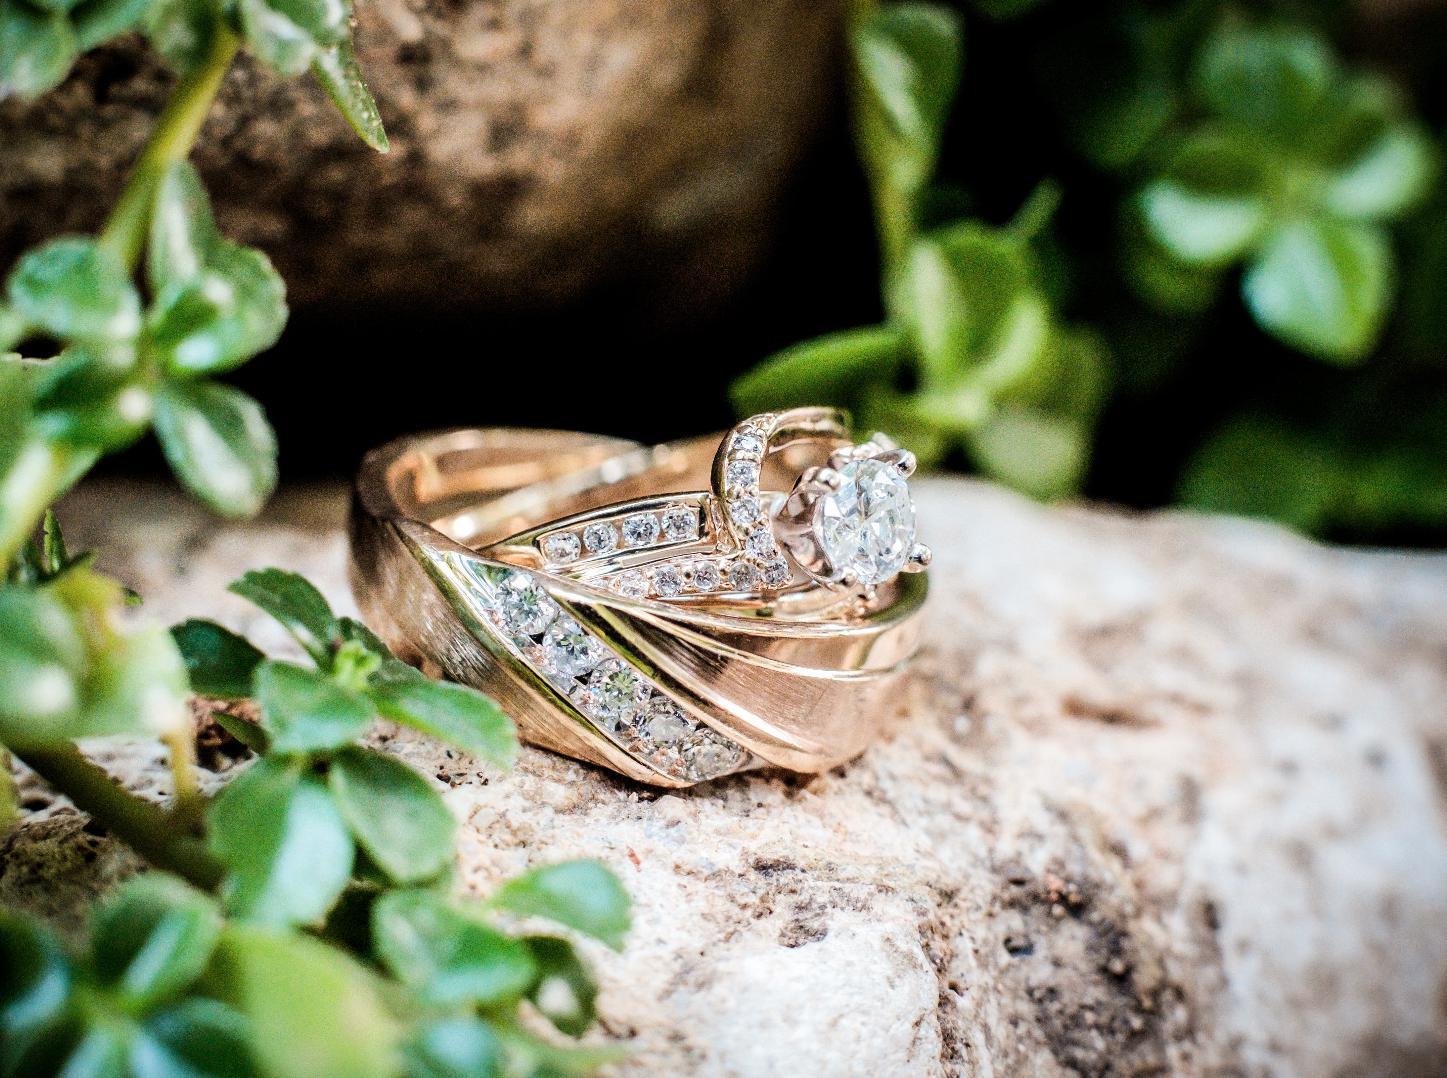 bodas-sin-clasificar-sin-tema-cuba-28082.jpg